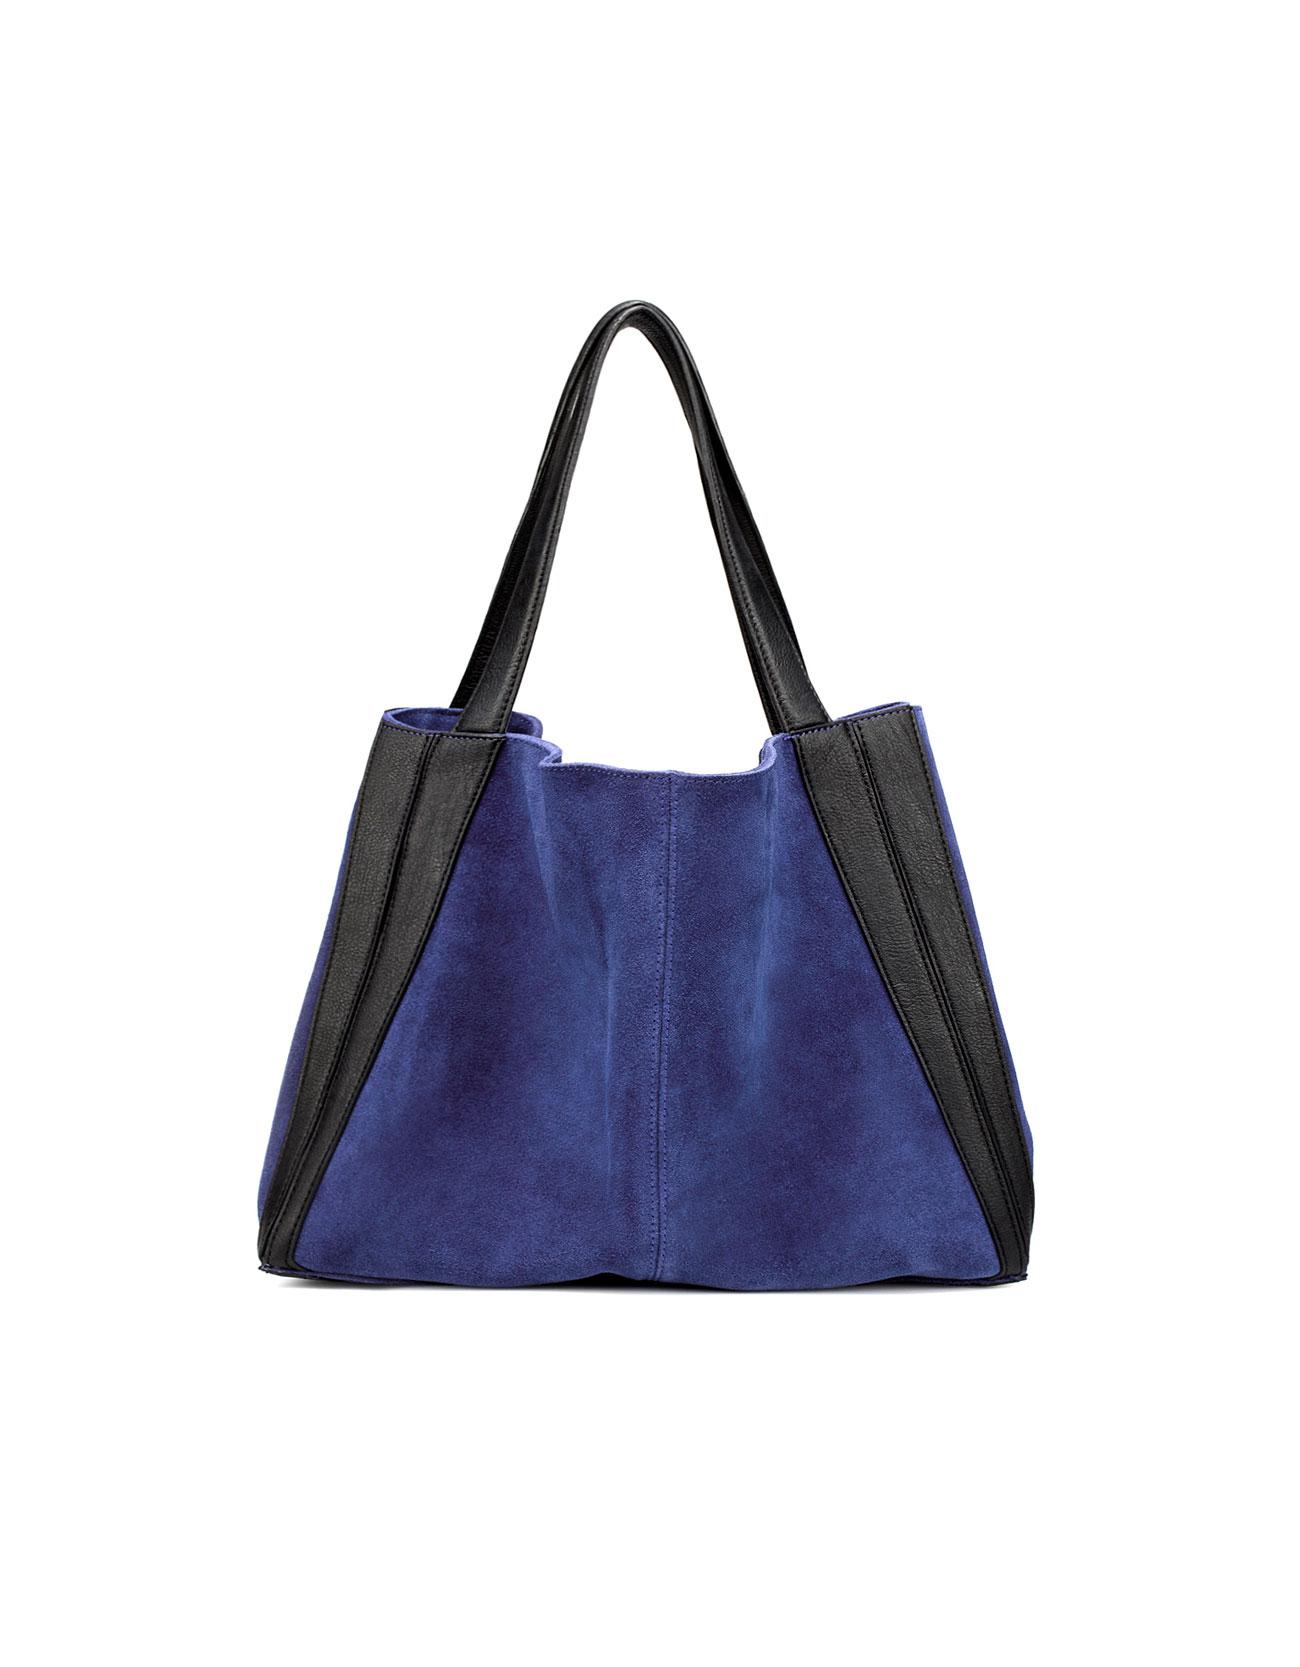 Zara Suede Handbag in Blue | Lyst